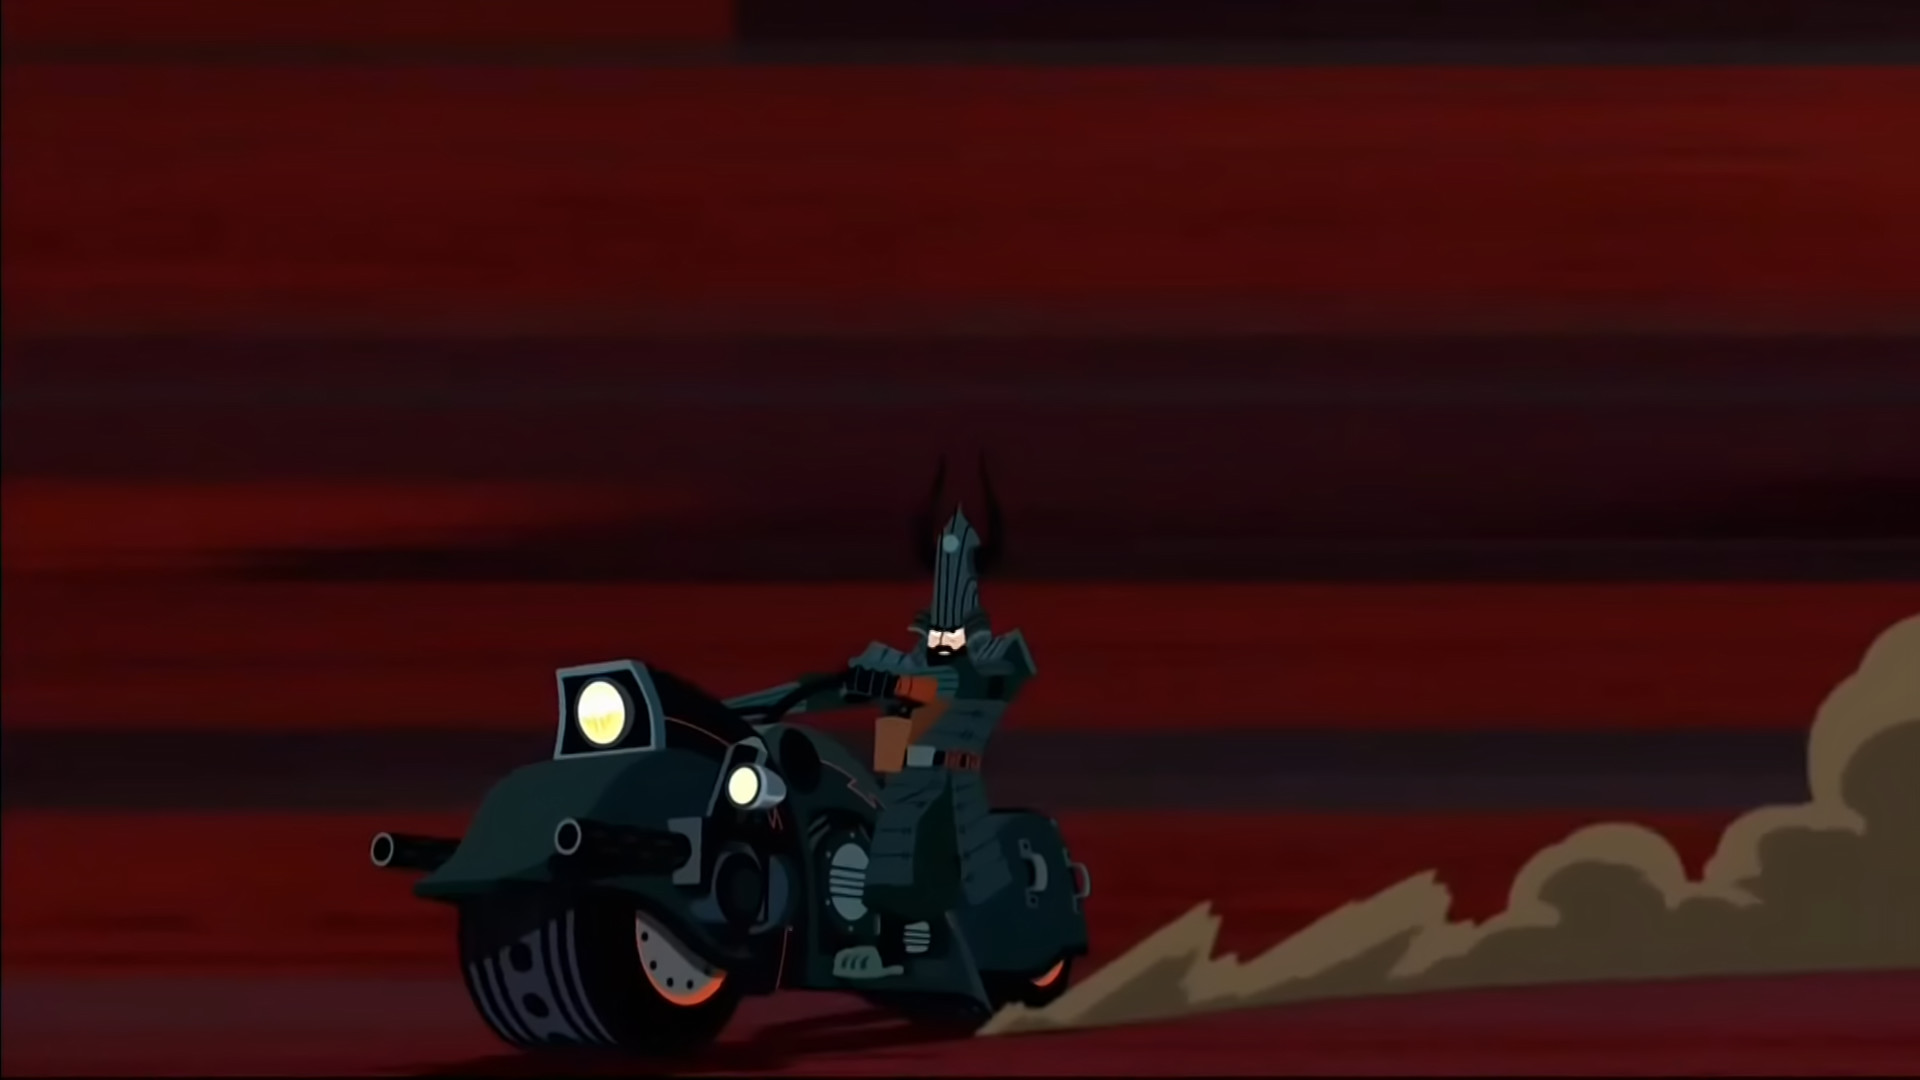 Jack's Motorcycle